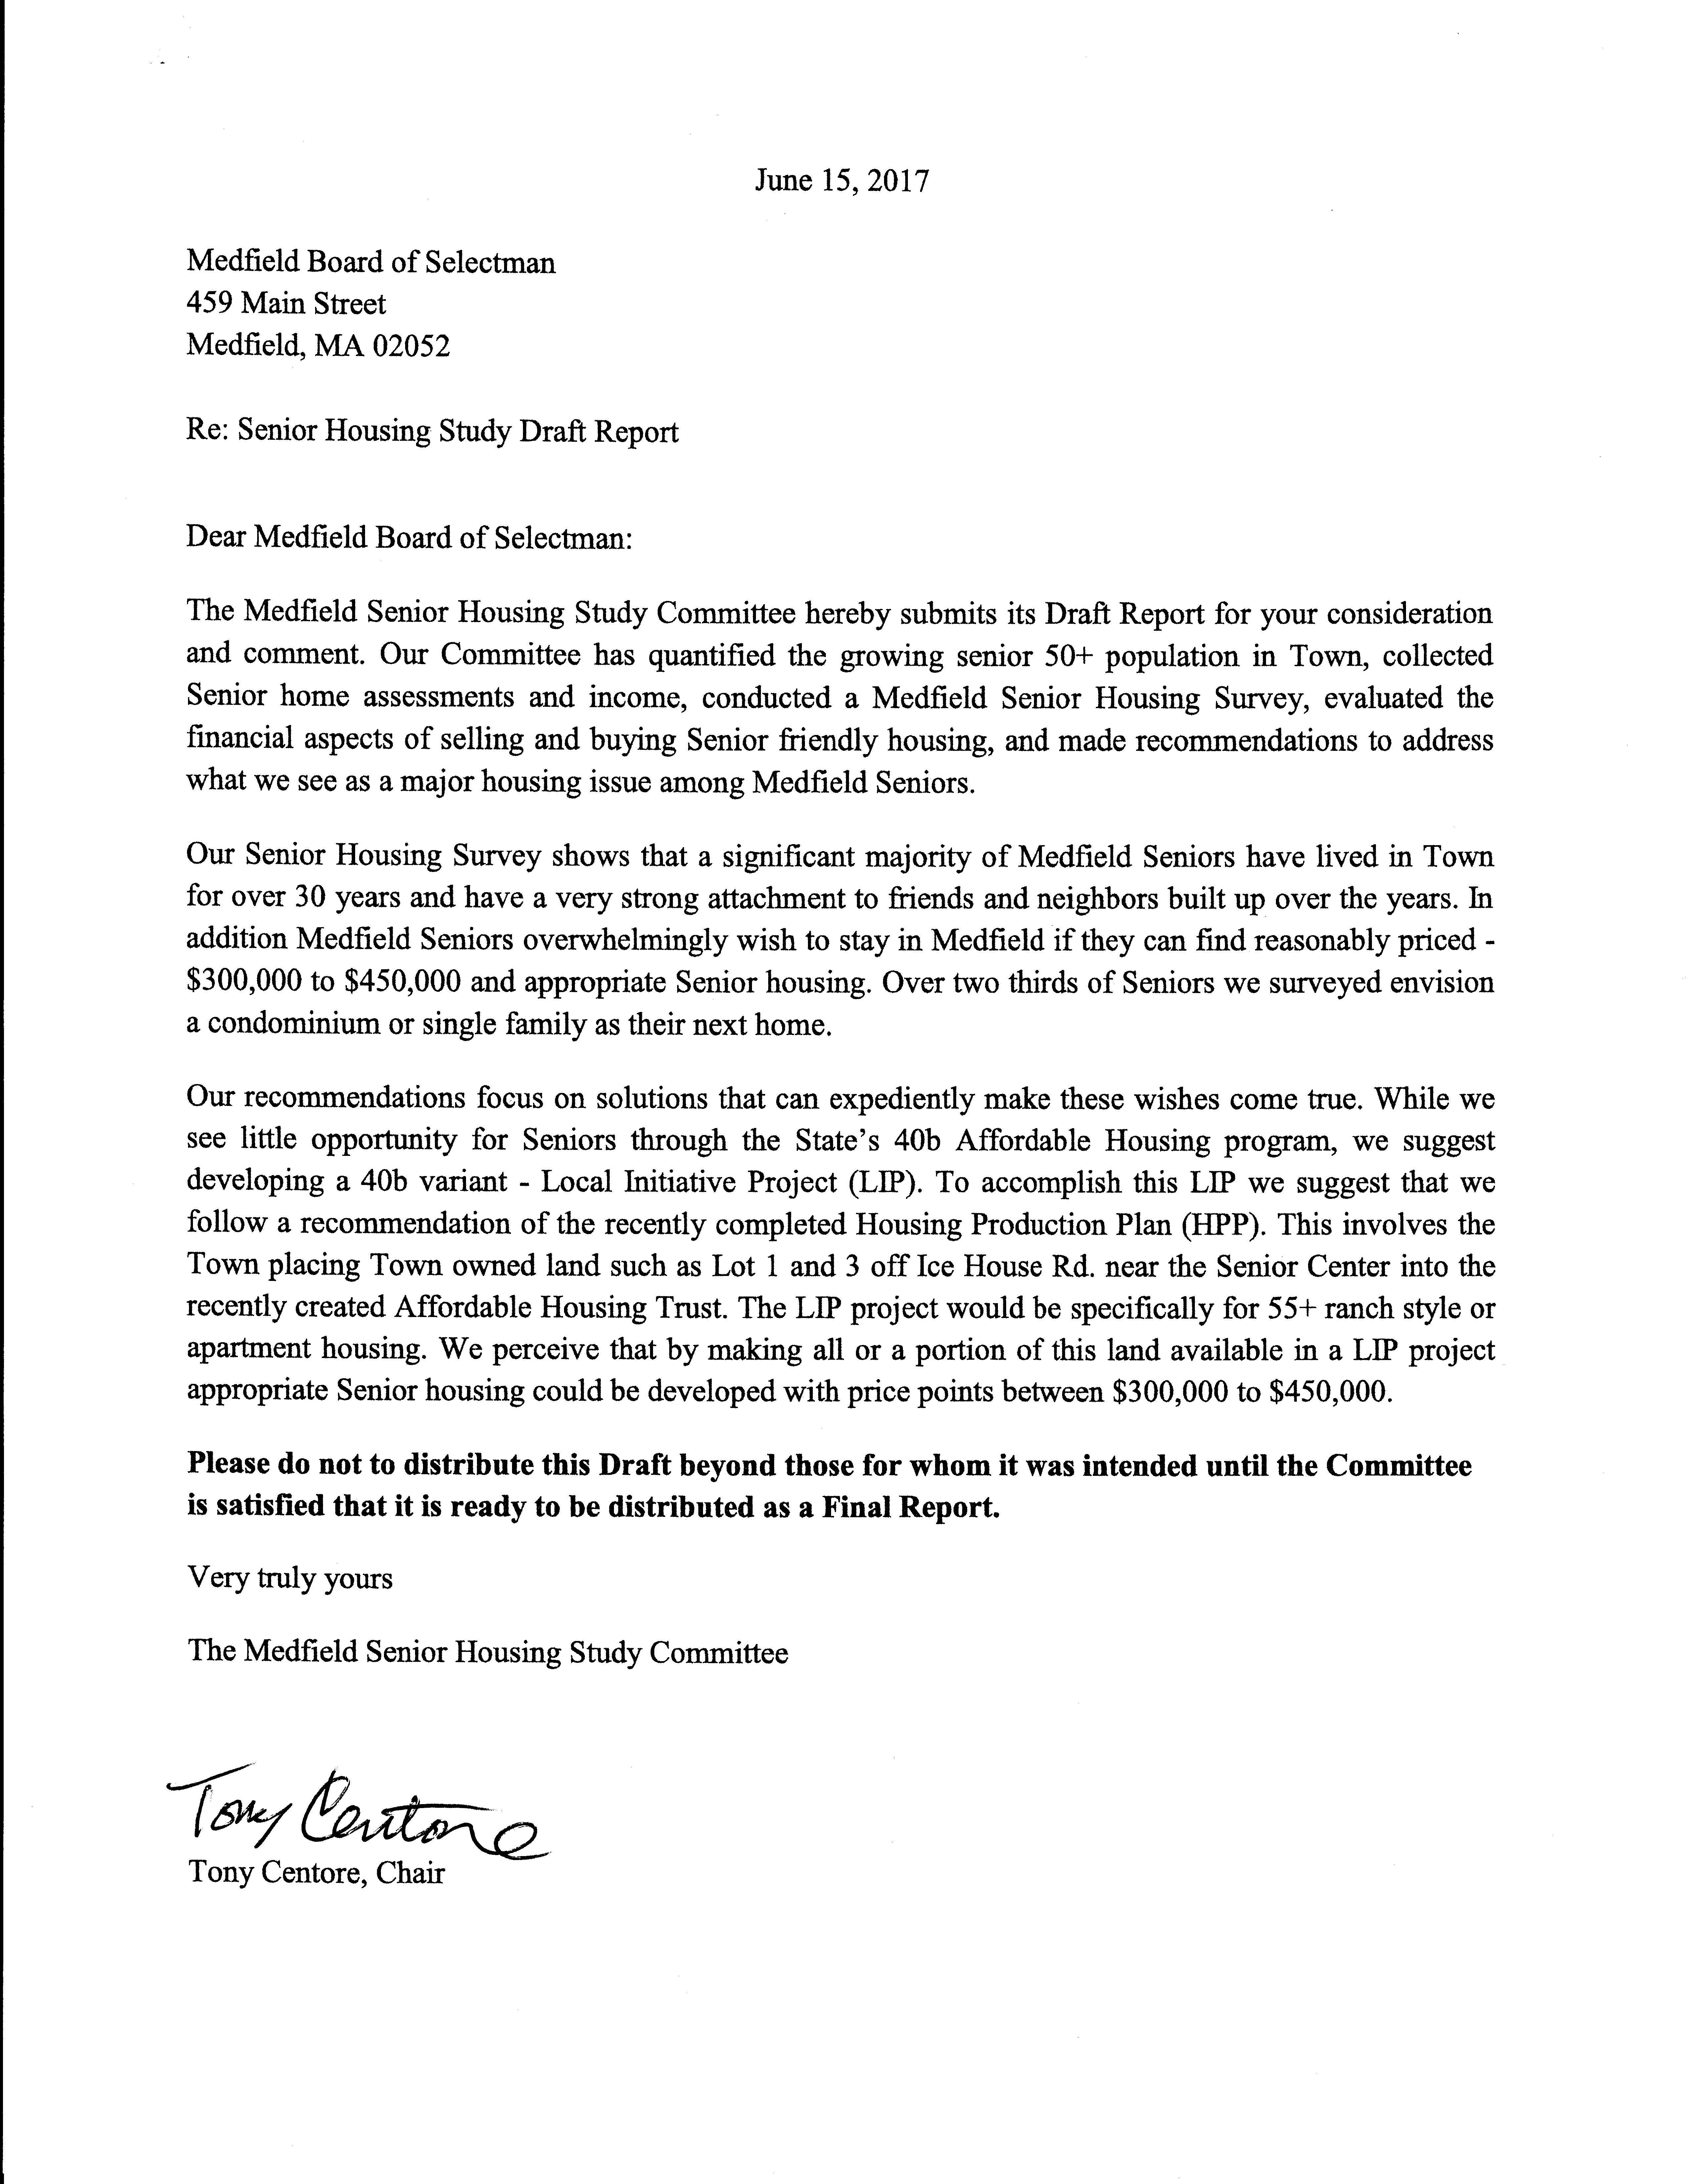 Senior Housing Study Committee Report Medfield02052s Blog